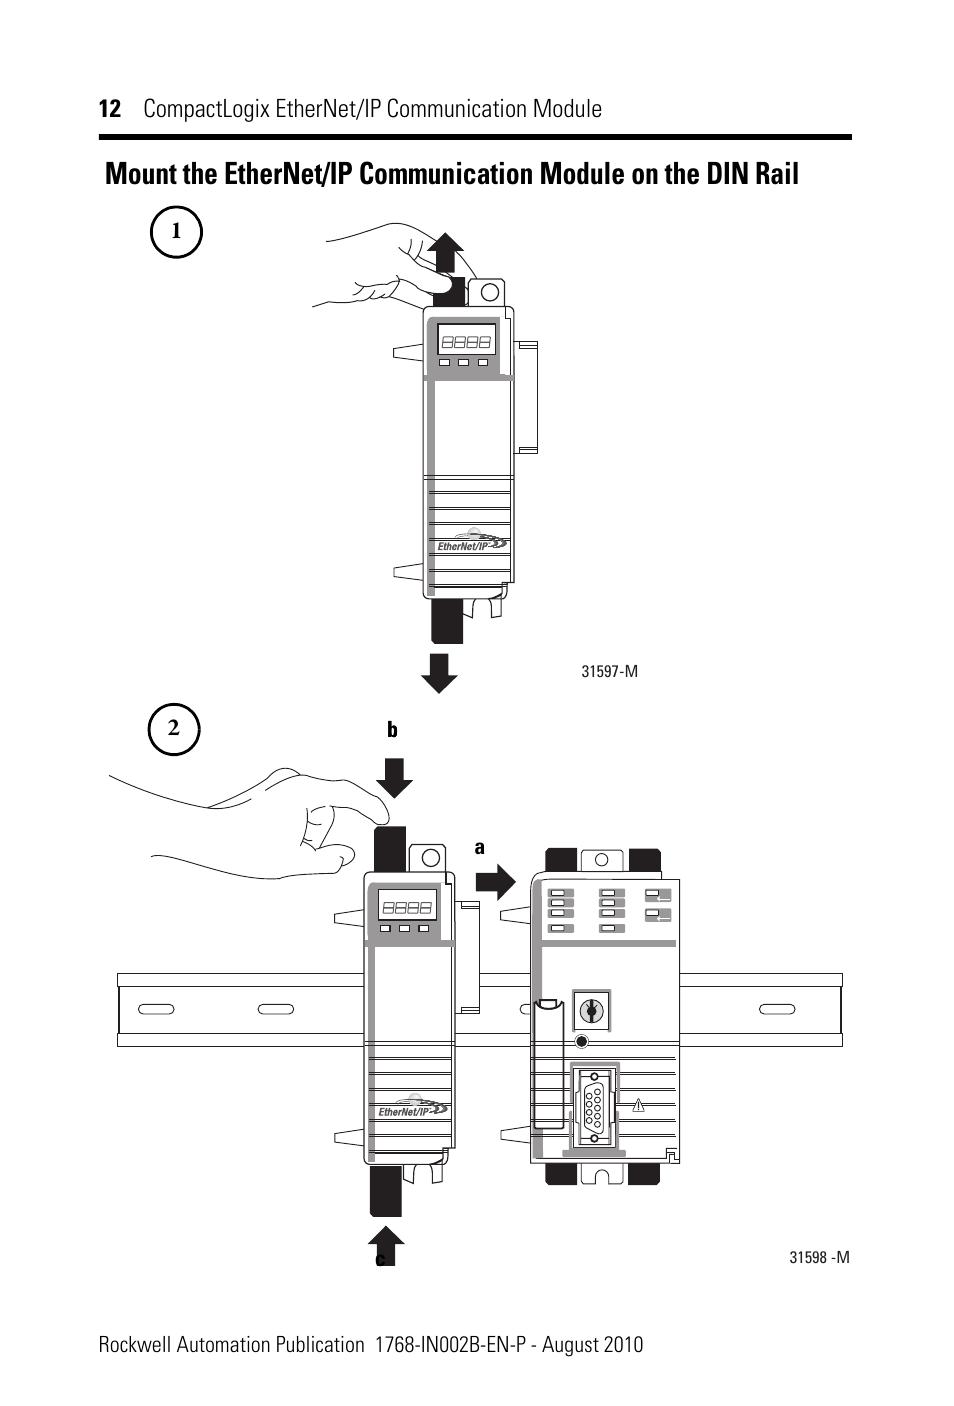 Rockwell Automation 1768-ENBT CompactLogix EtherNet/IP